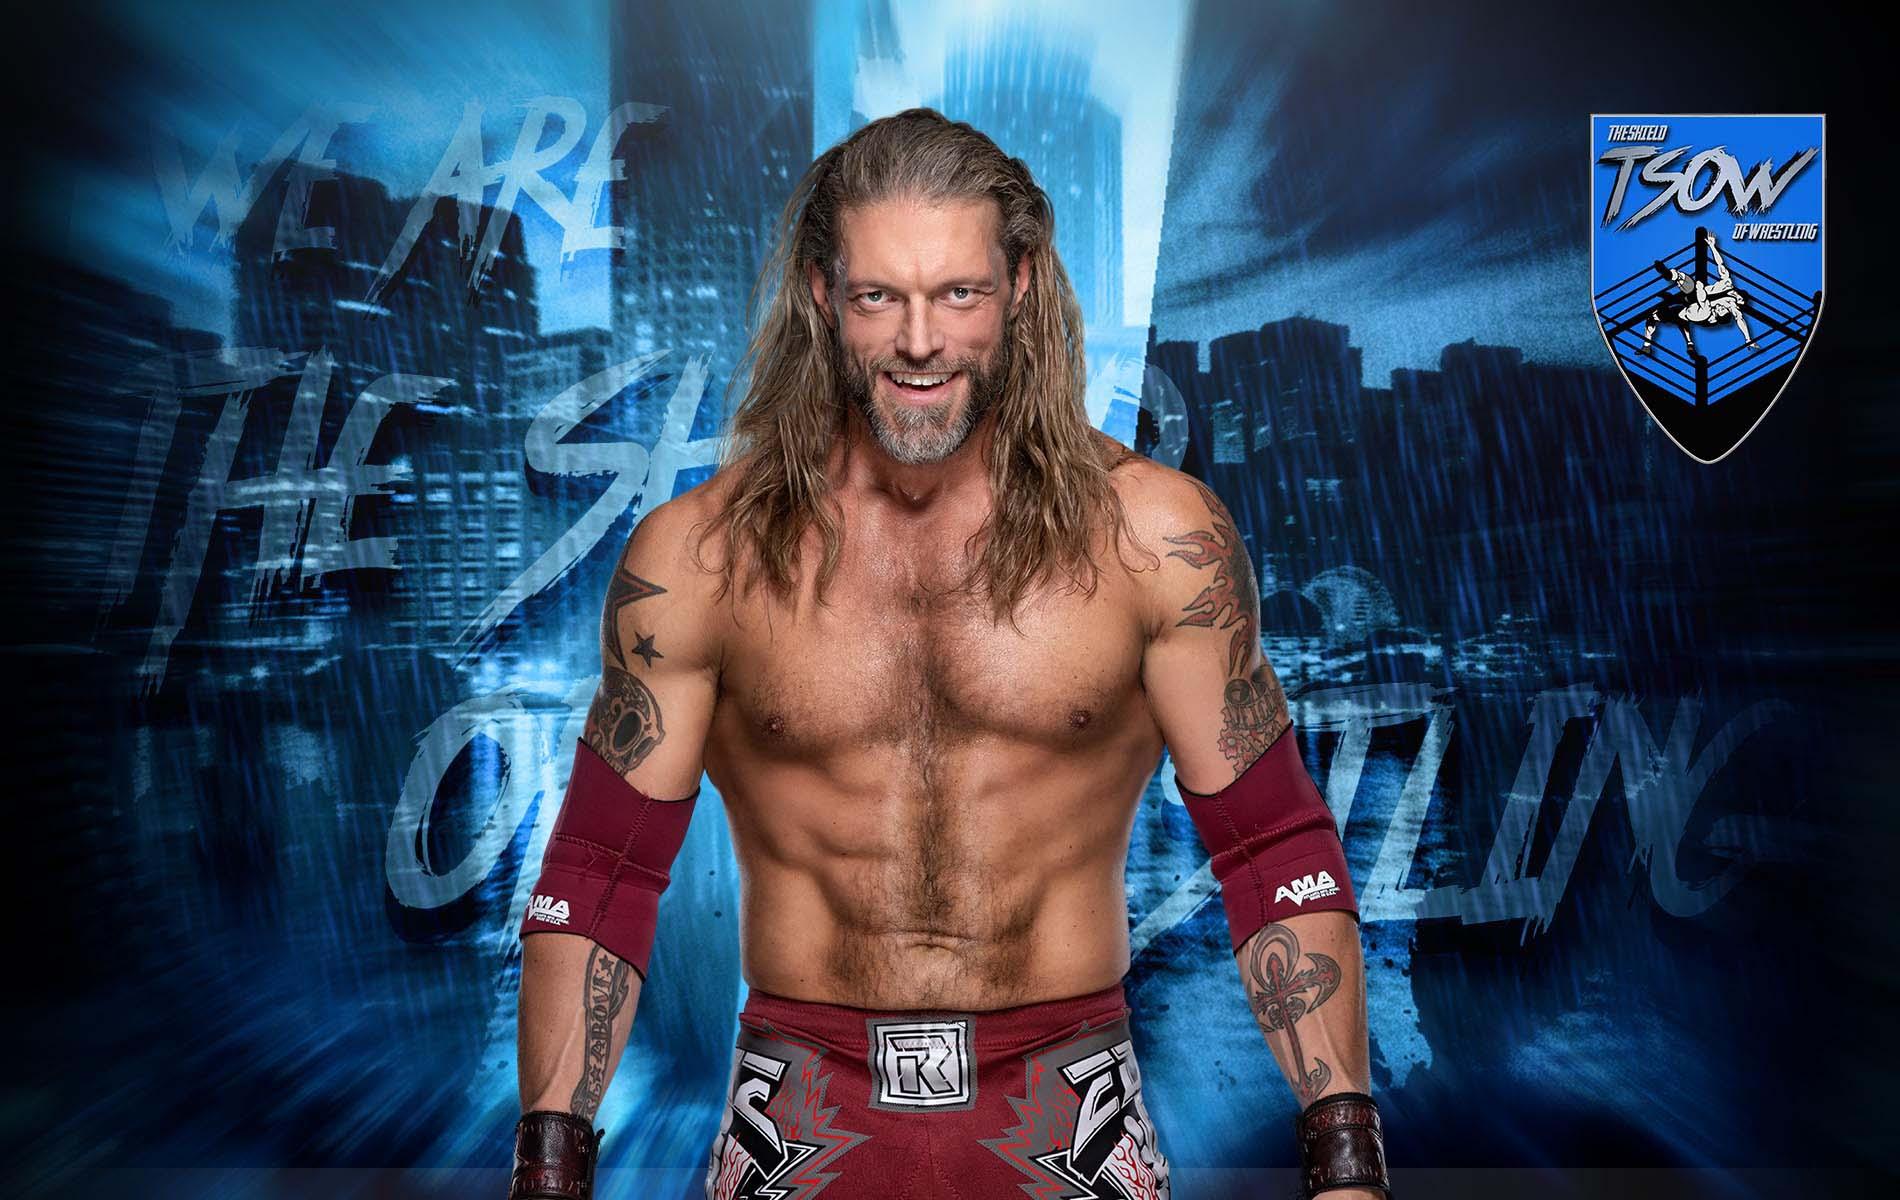 Edge tornerà in azione alla Royal Rumble?